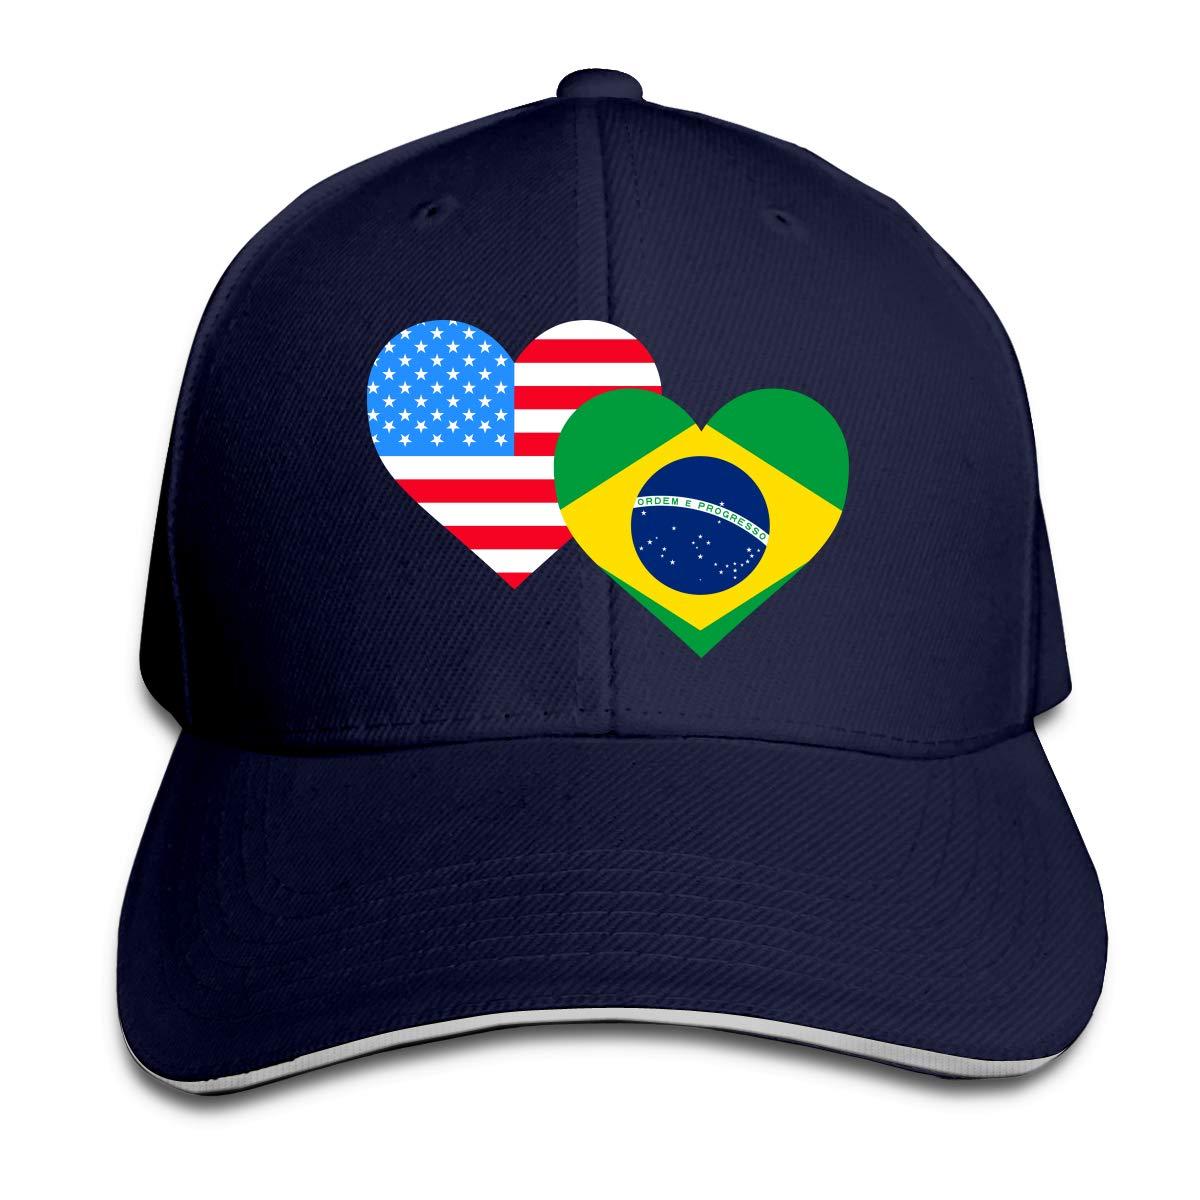 JustQbob1 American Brazil Heart Flag Outdoor Snapback Sandwich Cap Adjustable Baseball Hat Plain Cap